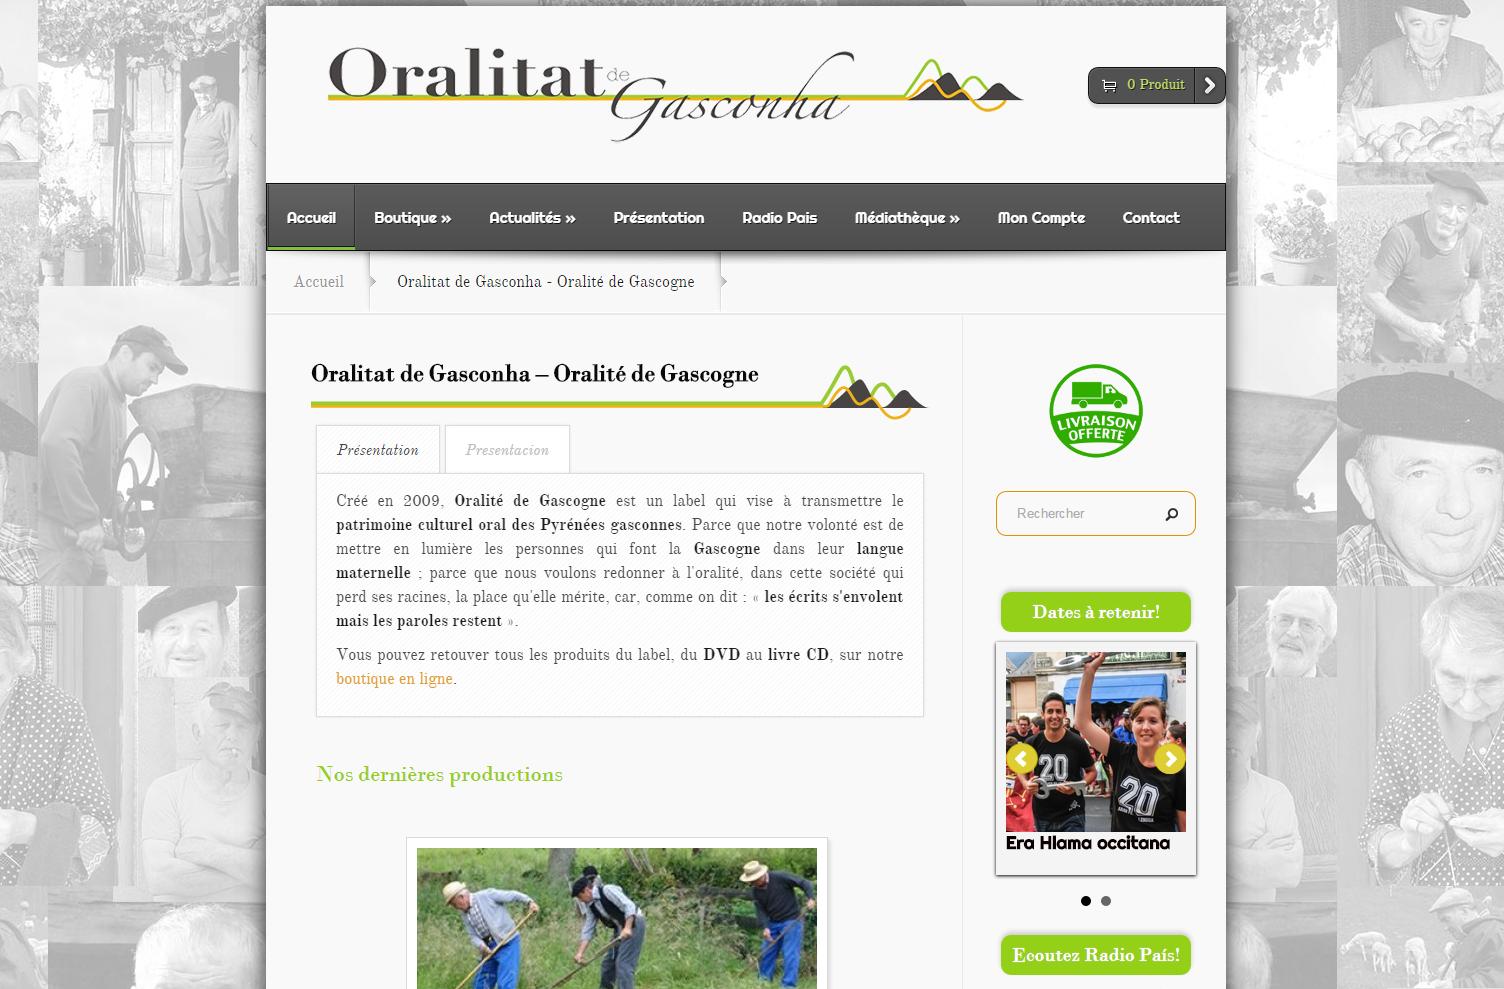 Boutique en ligne • Oralitat de Gasconha